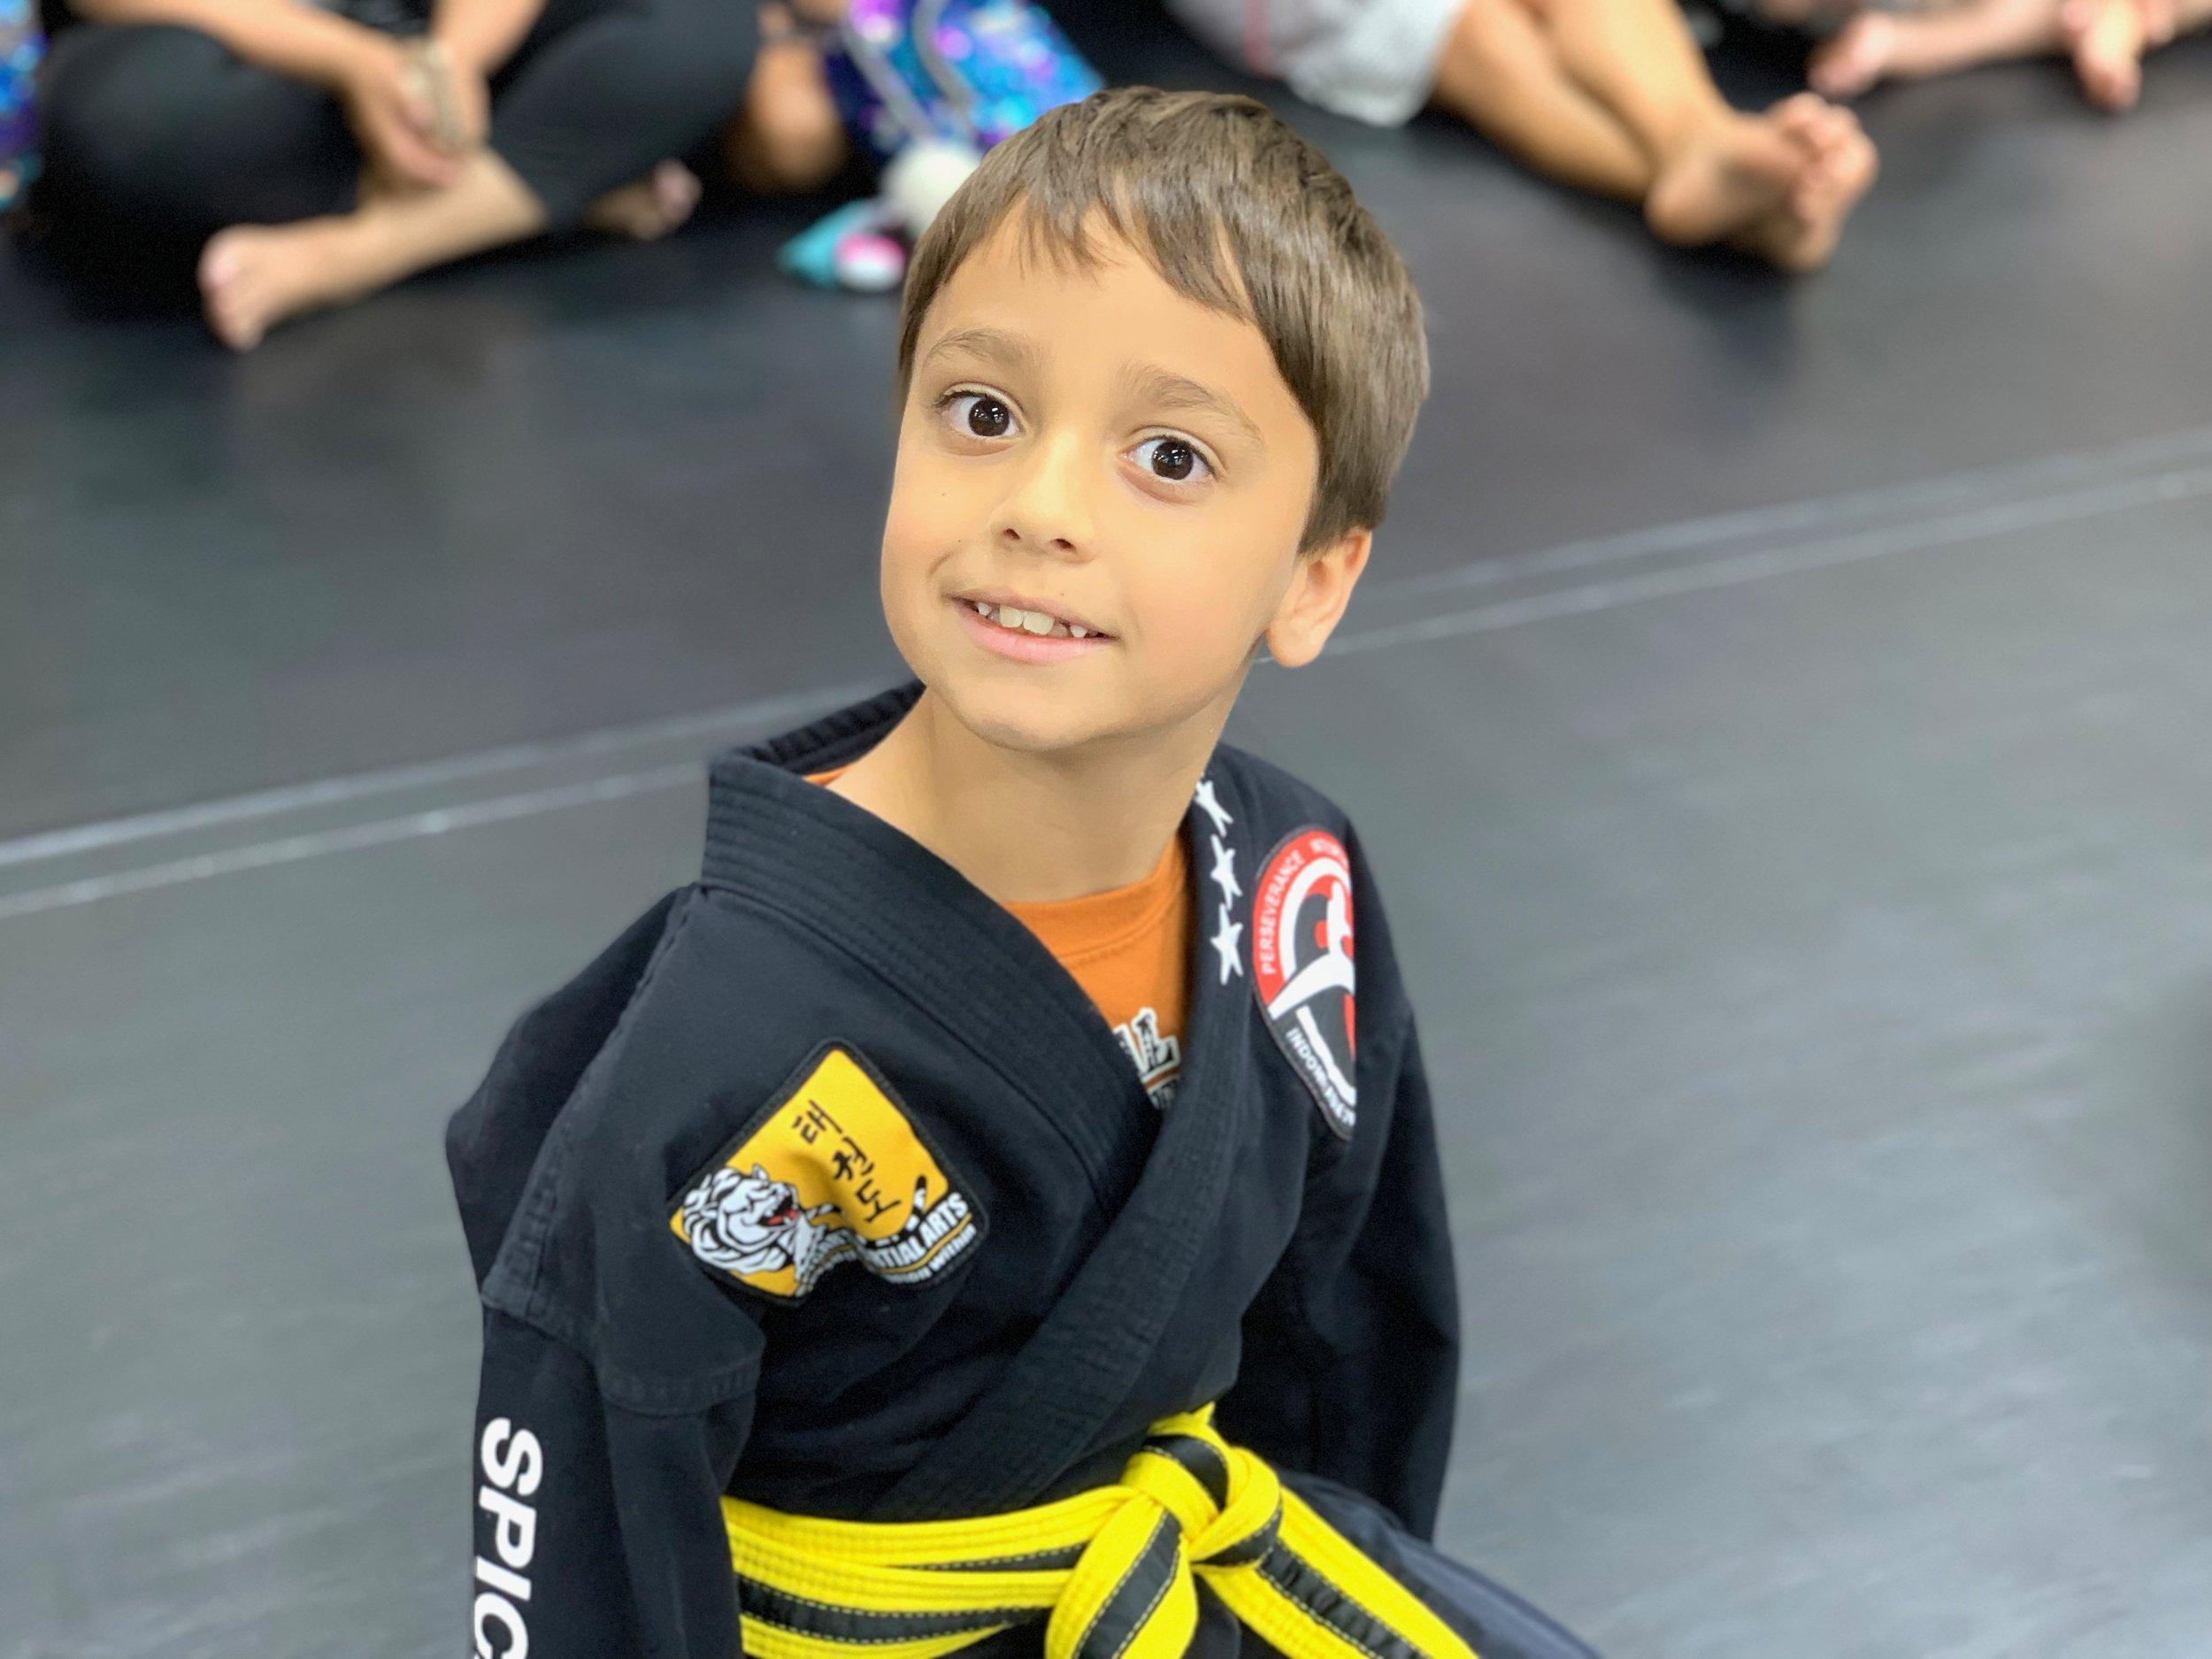 karate-kids-program-souhtlake-keller-grapevine-texas00009.jpeg